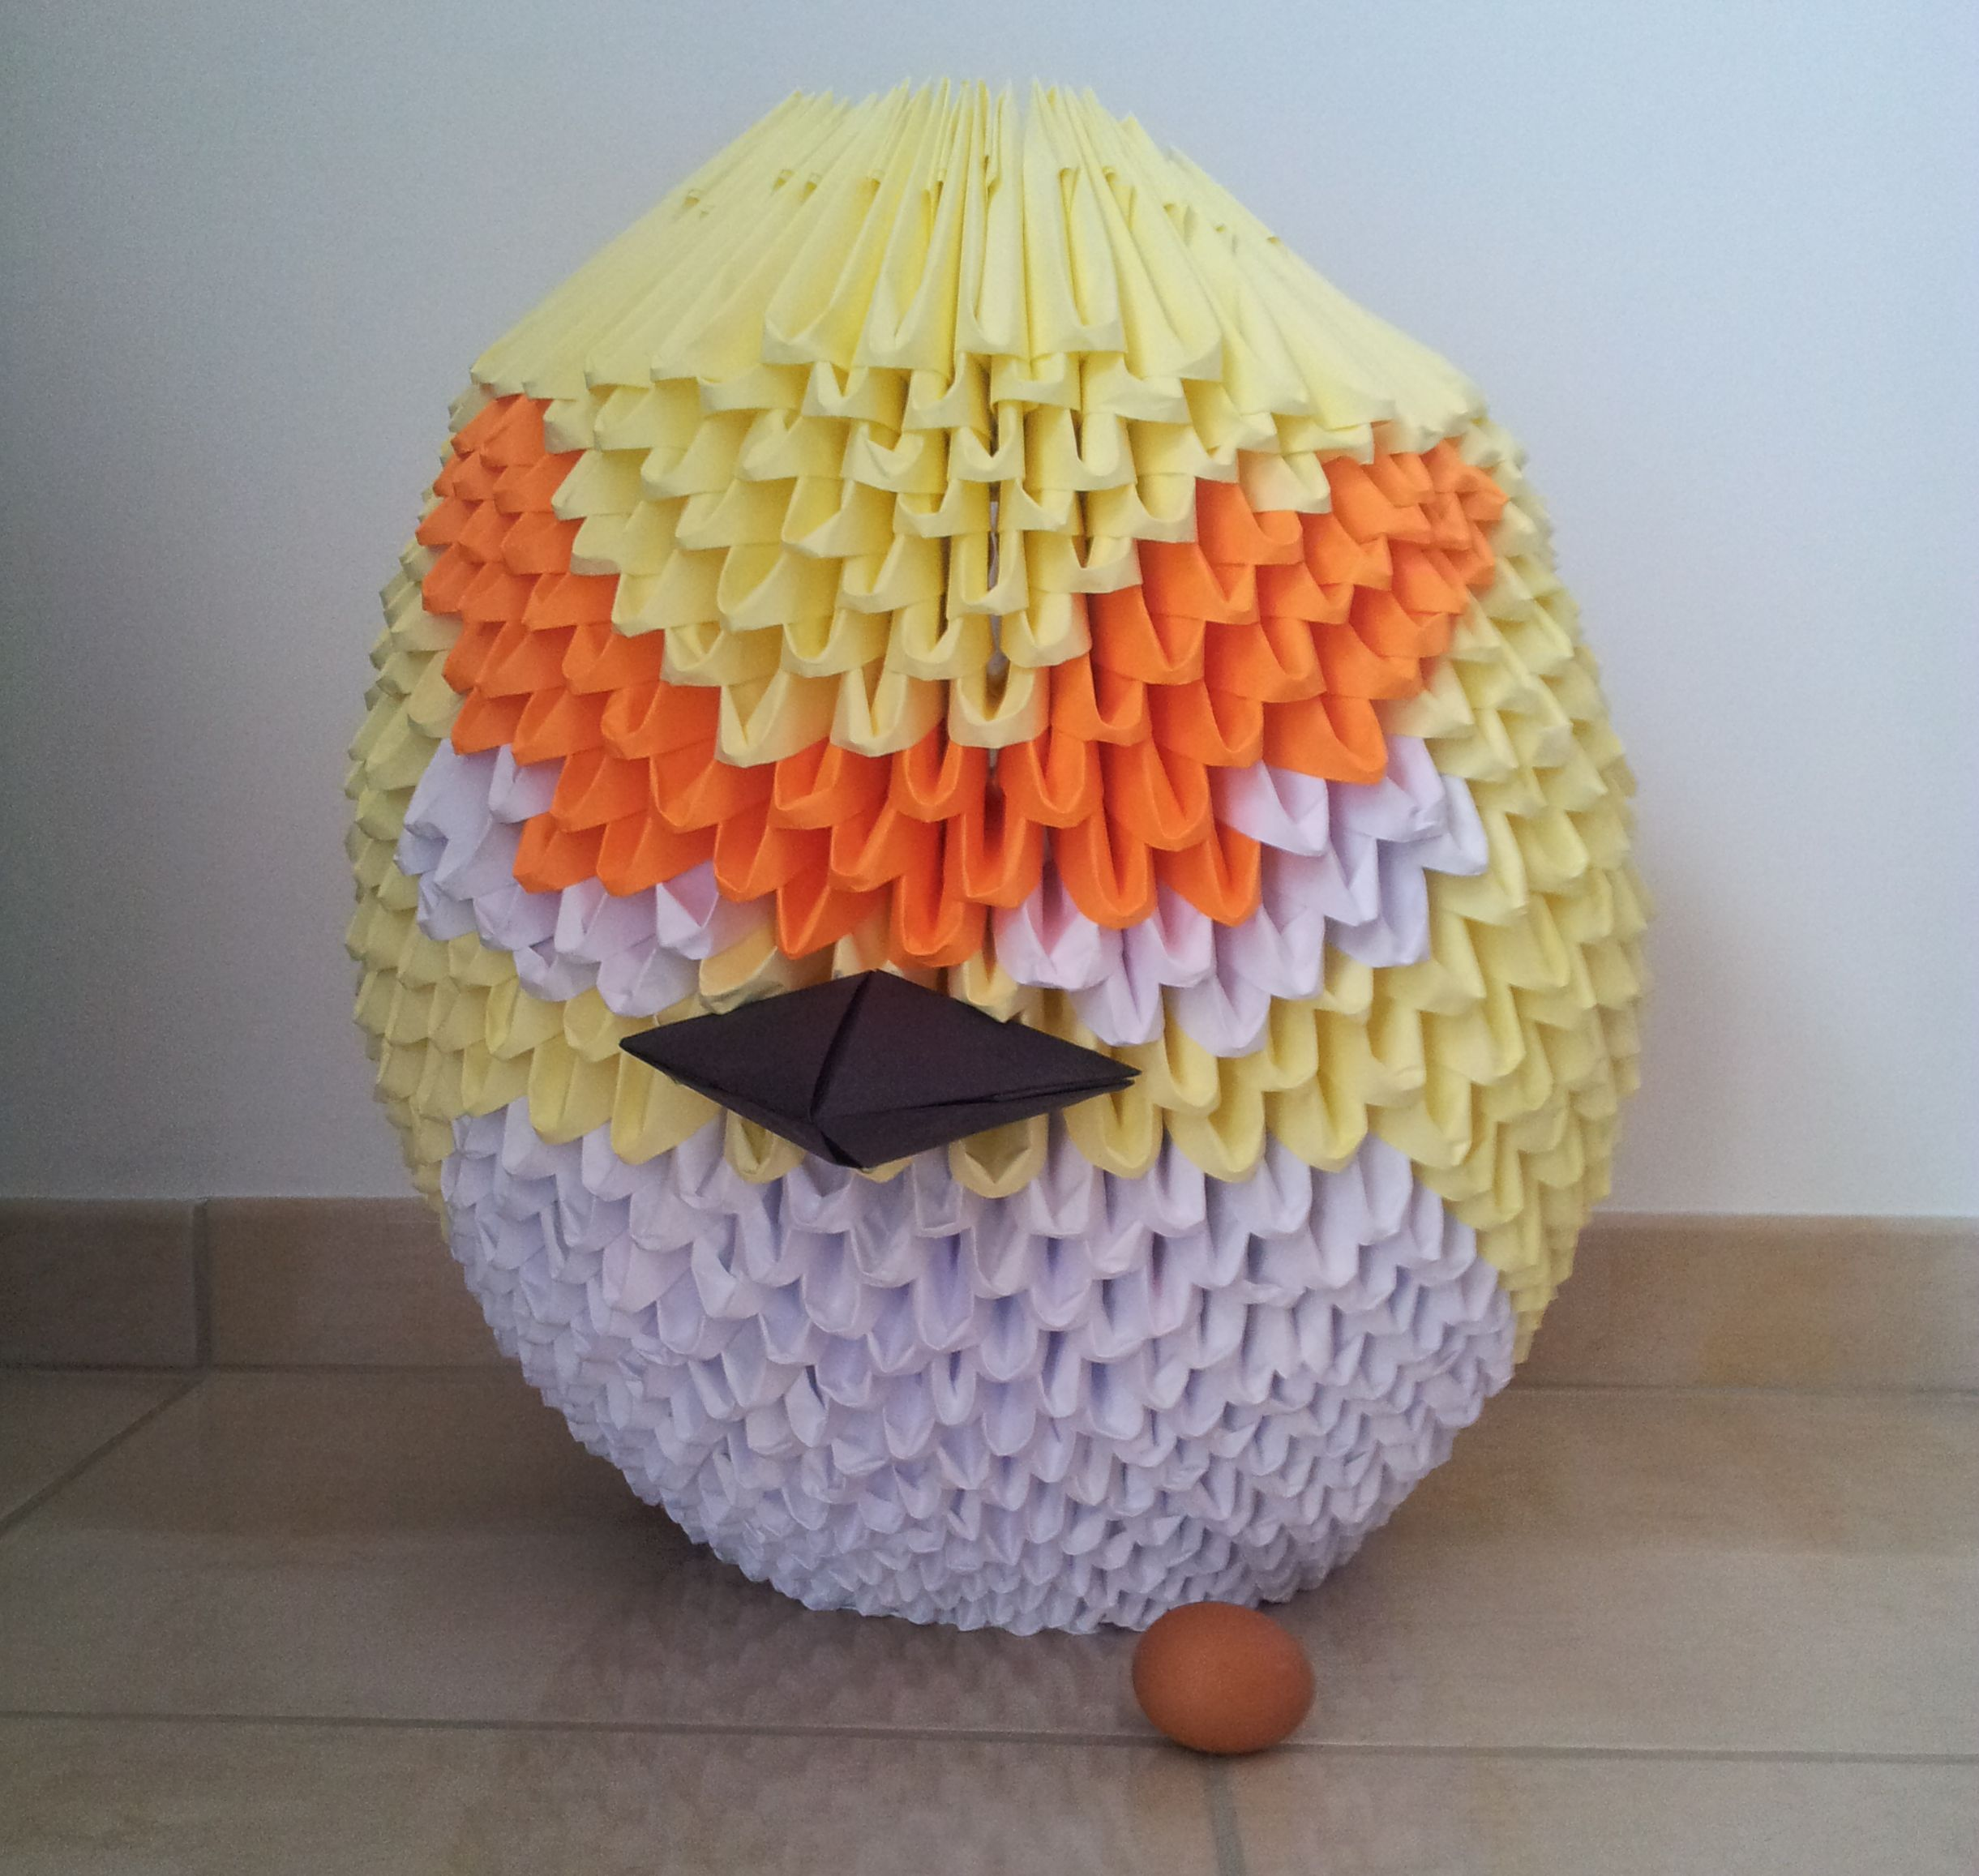 Un Angry Birds géant en Origami 3D